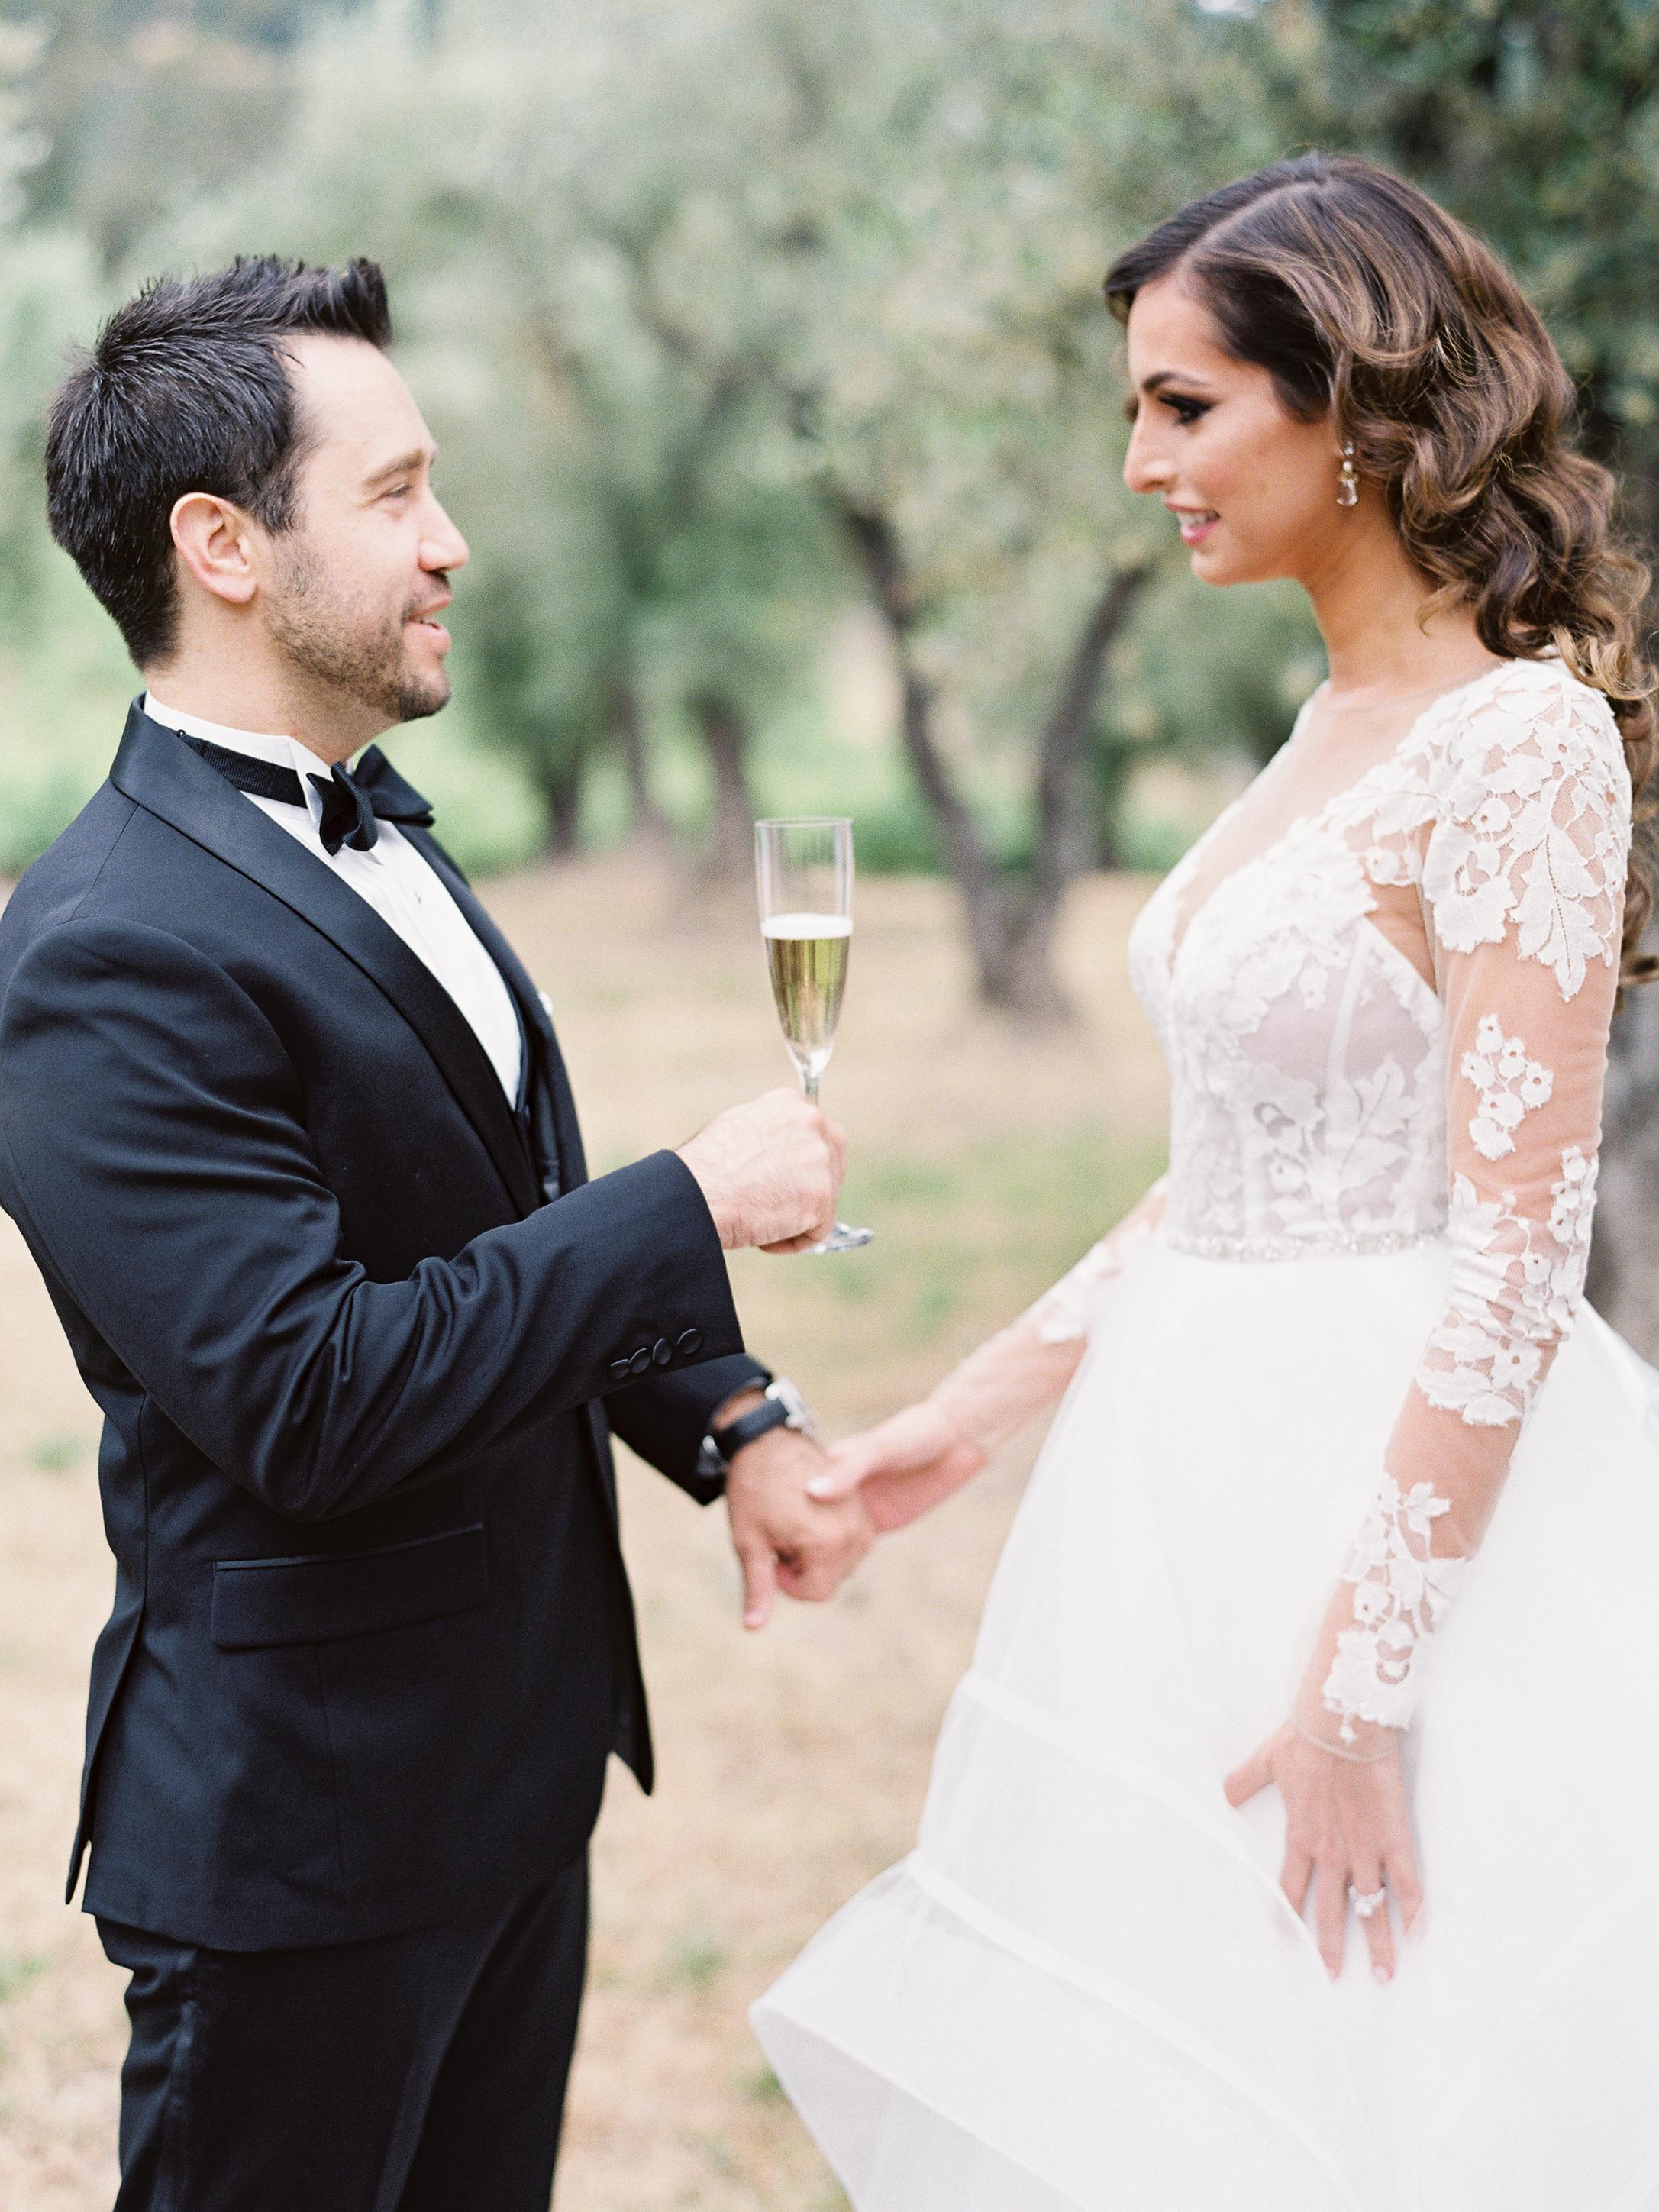 Meghan Mehan Photography   Fine Art Film Wedding Photographer   California   San Francisco   Napa   Sonoma   Santa Barbara   Big Sur   Destination Wedding Photographer 026.jpg